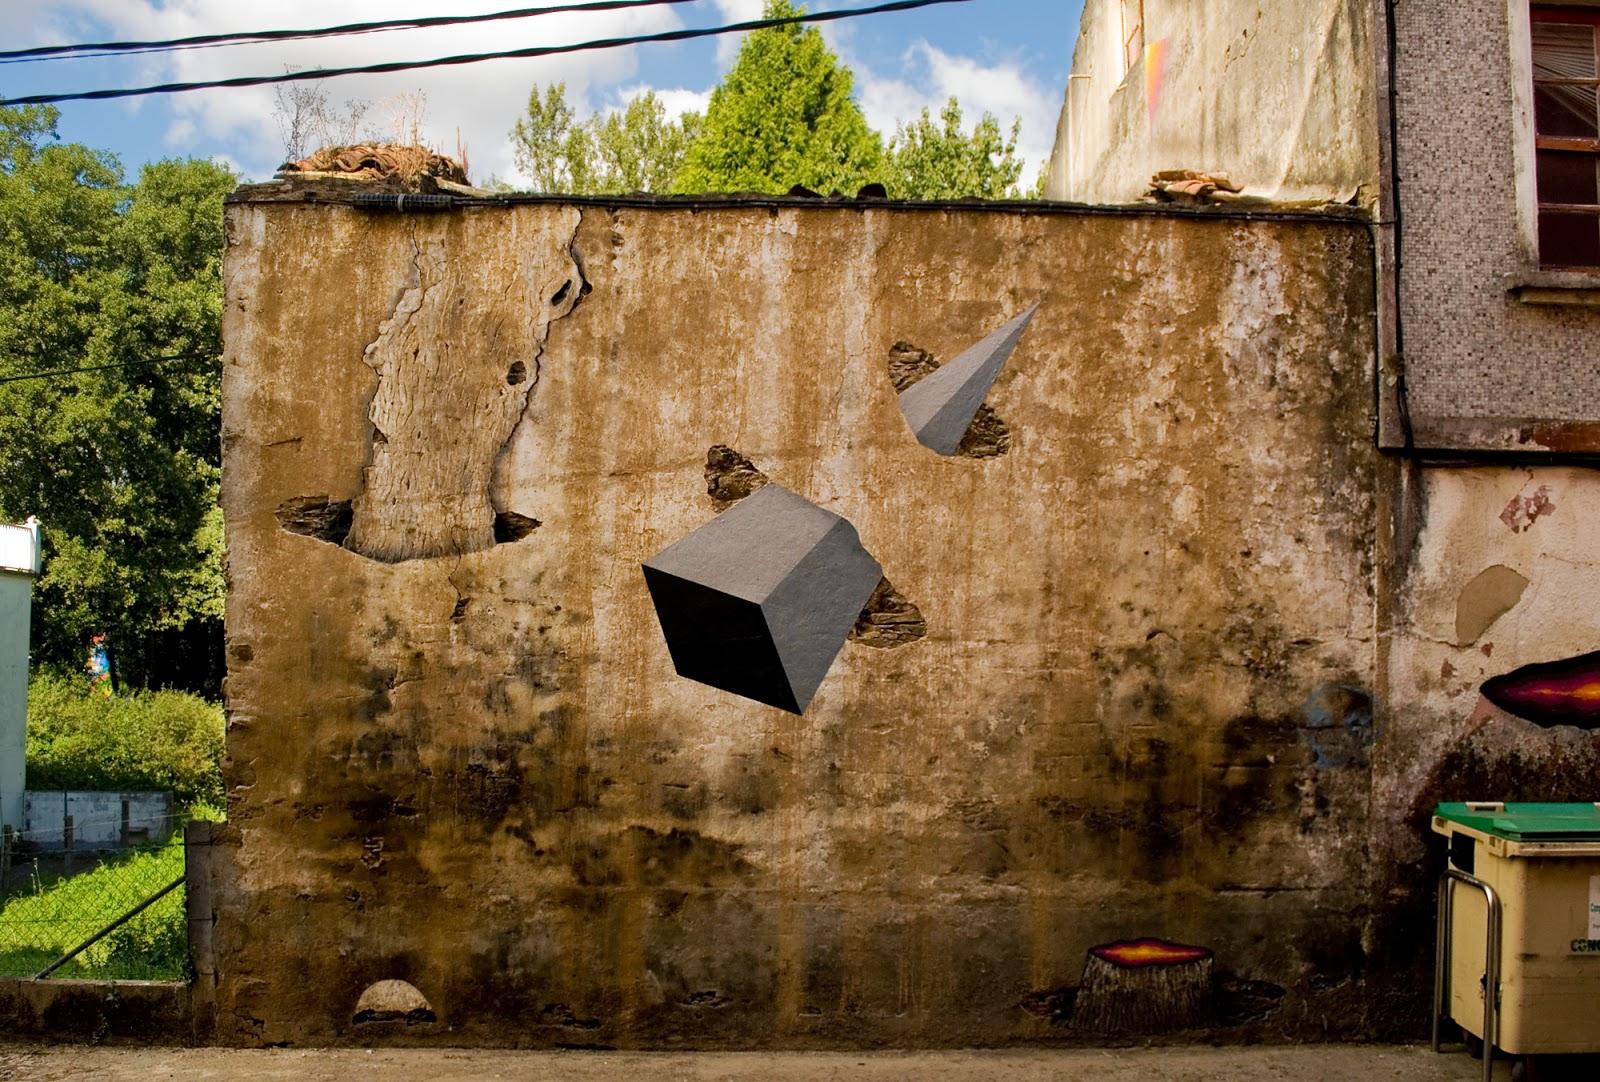 e1000-new-murals-desordes-creativas-2013-06